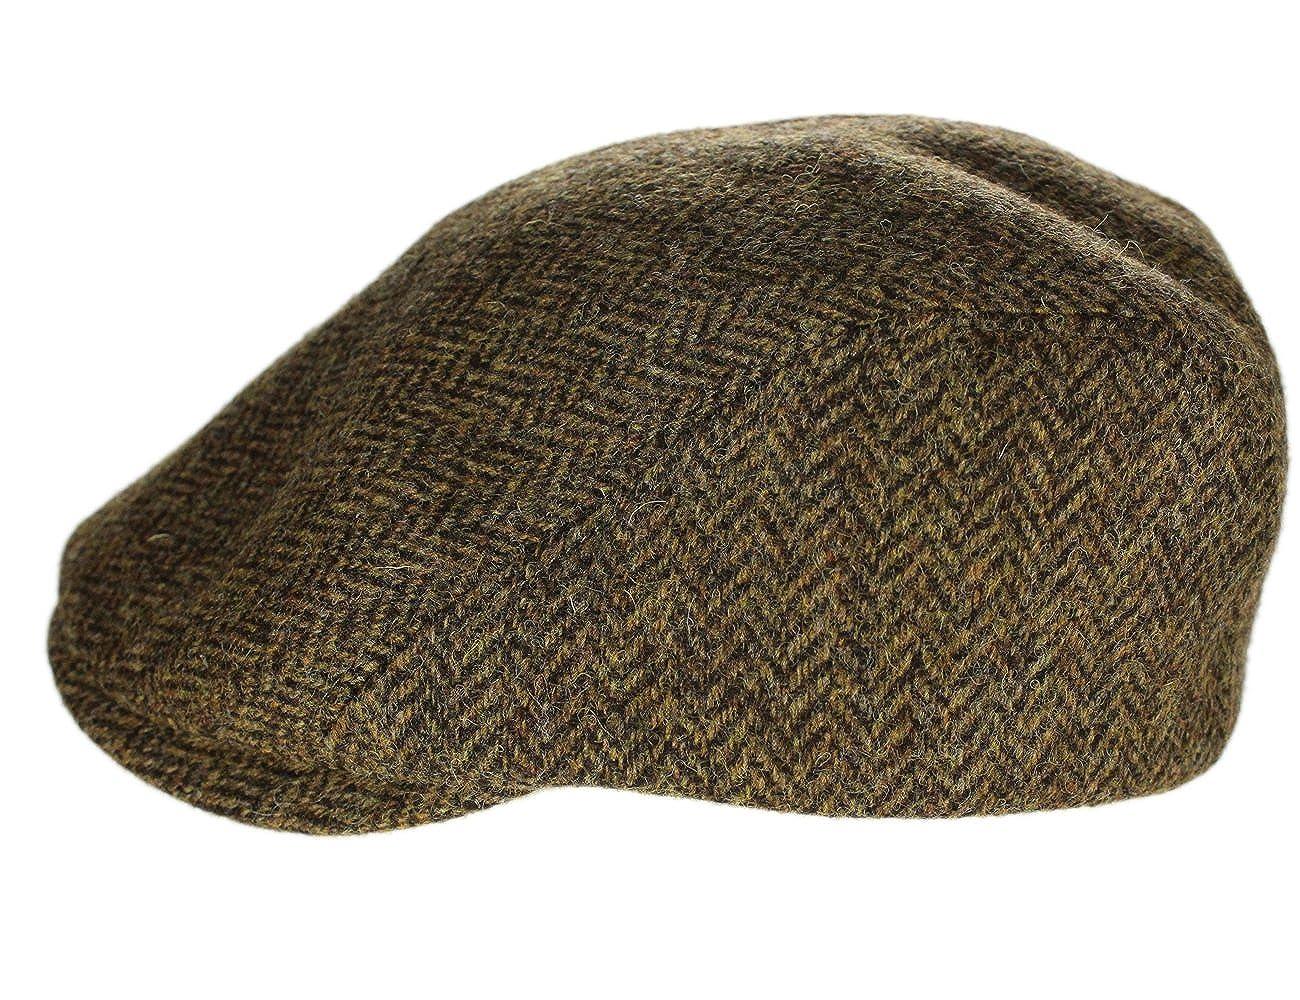 Biddy Murphy Irish Gifts Irish Touring Cap Extended Brim Irish Tweed Formfitting Cap Handcrafted In Ireland John Hanly & Co.